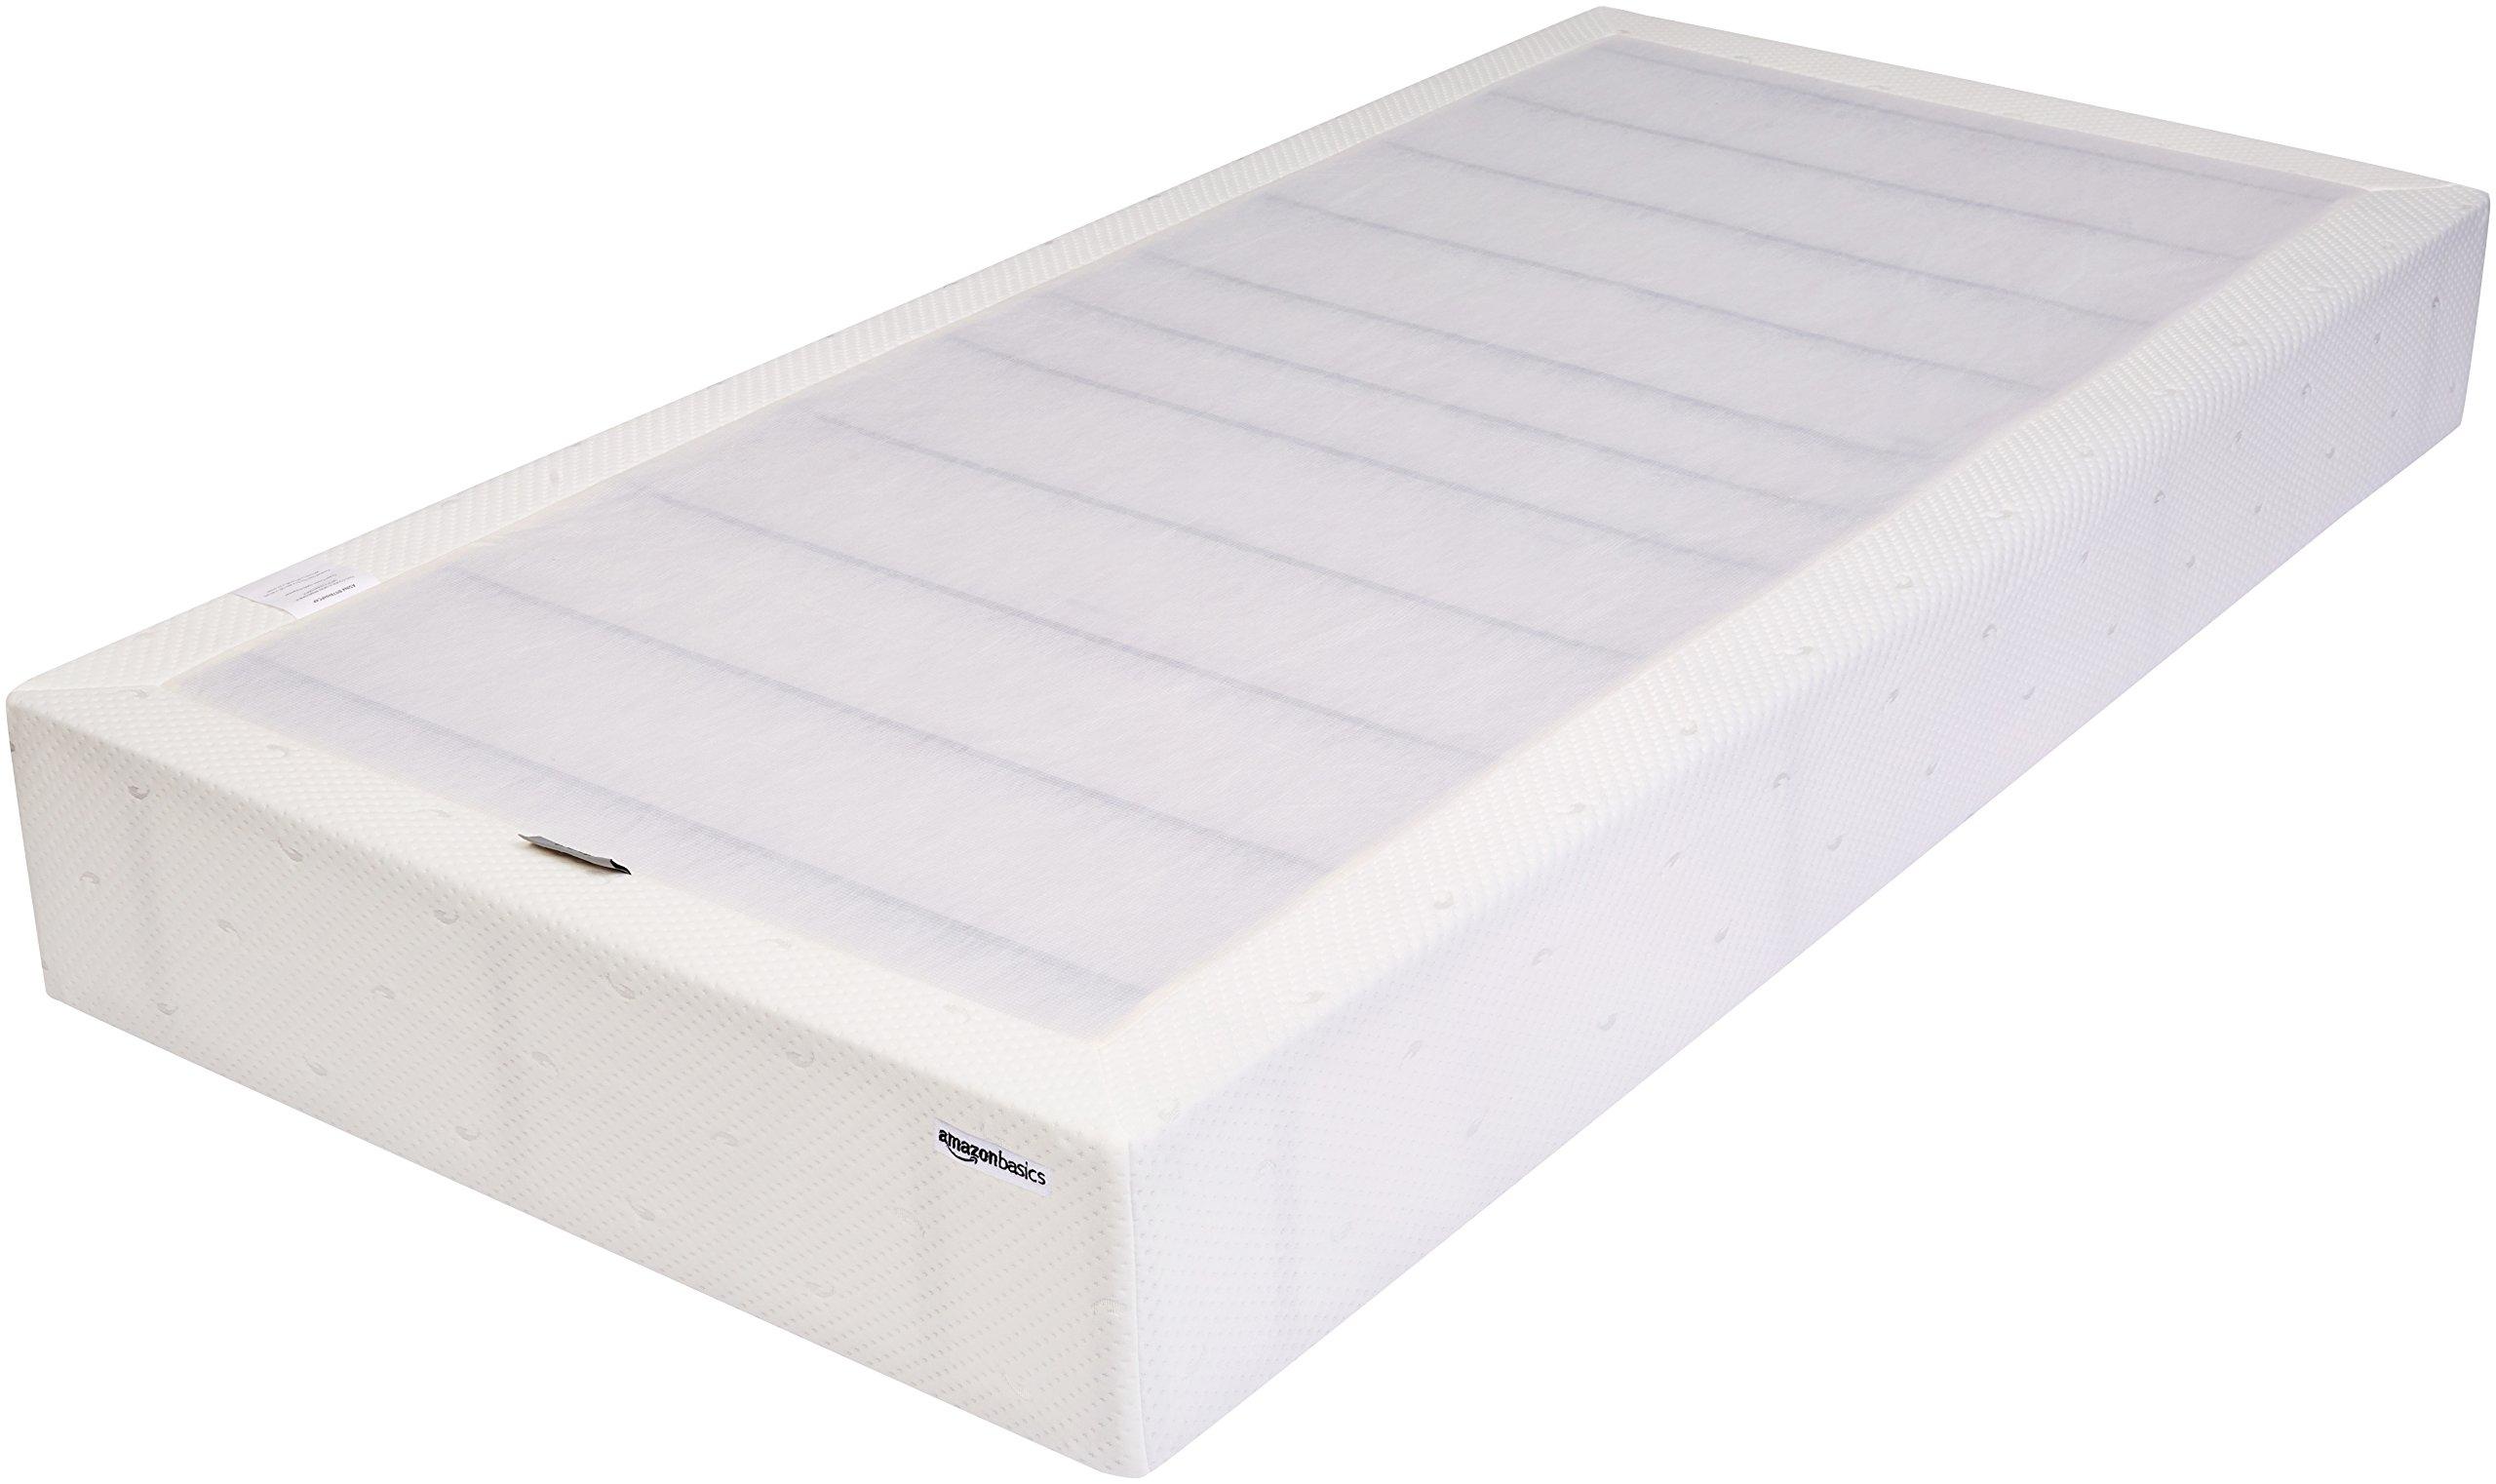 AmazonBasics Mattress Foundation / Smart Box Spring, Tool-Free Easy Assembly - 9-Inch, Twin XL